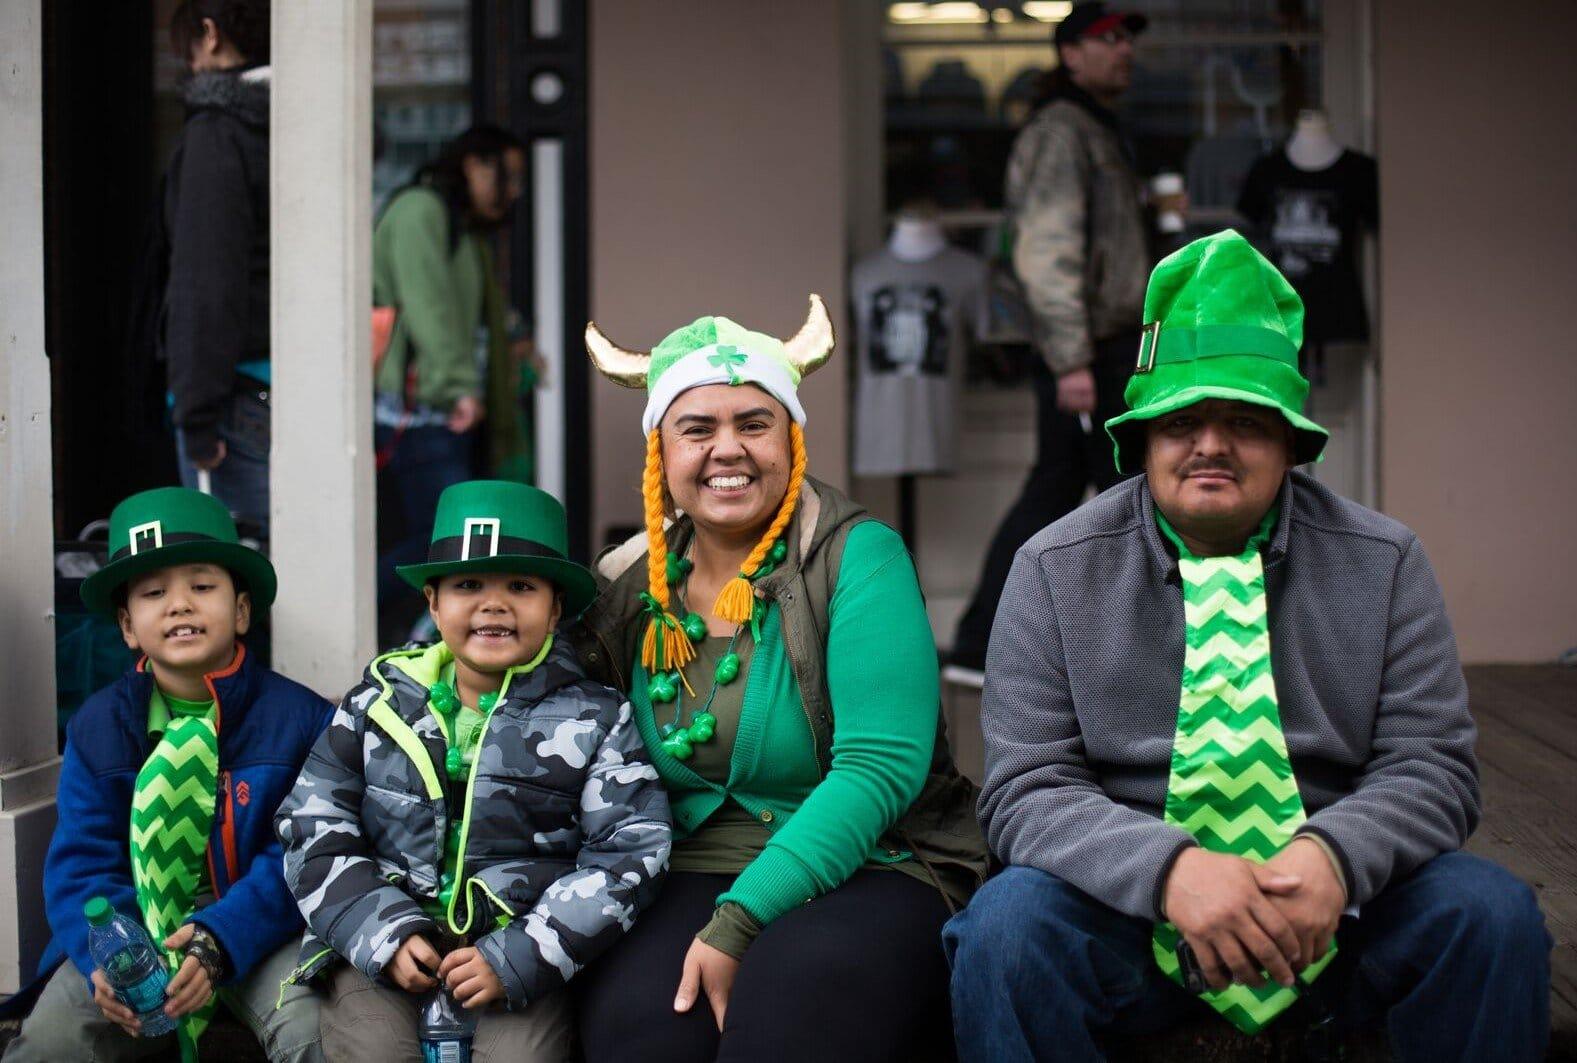 Shenanigans, Shamrocks & Leprechauns in Play at Downtown Sacramento via @sacramentopress